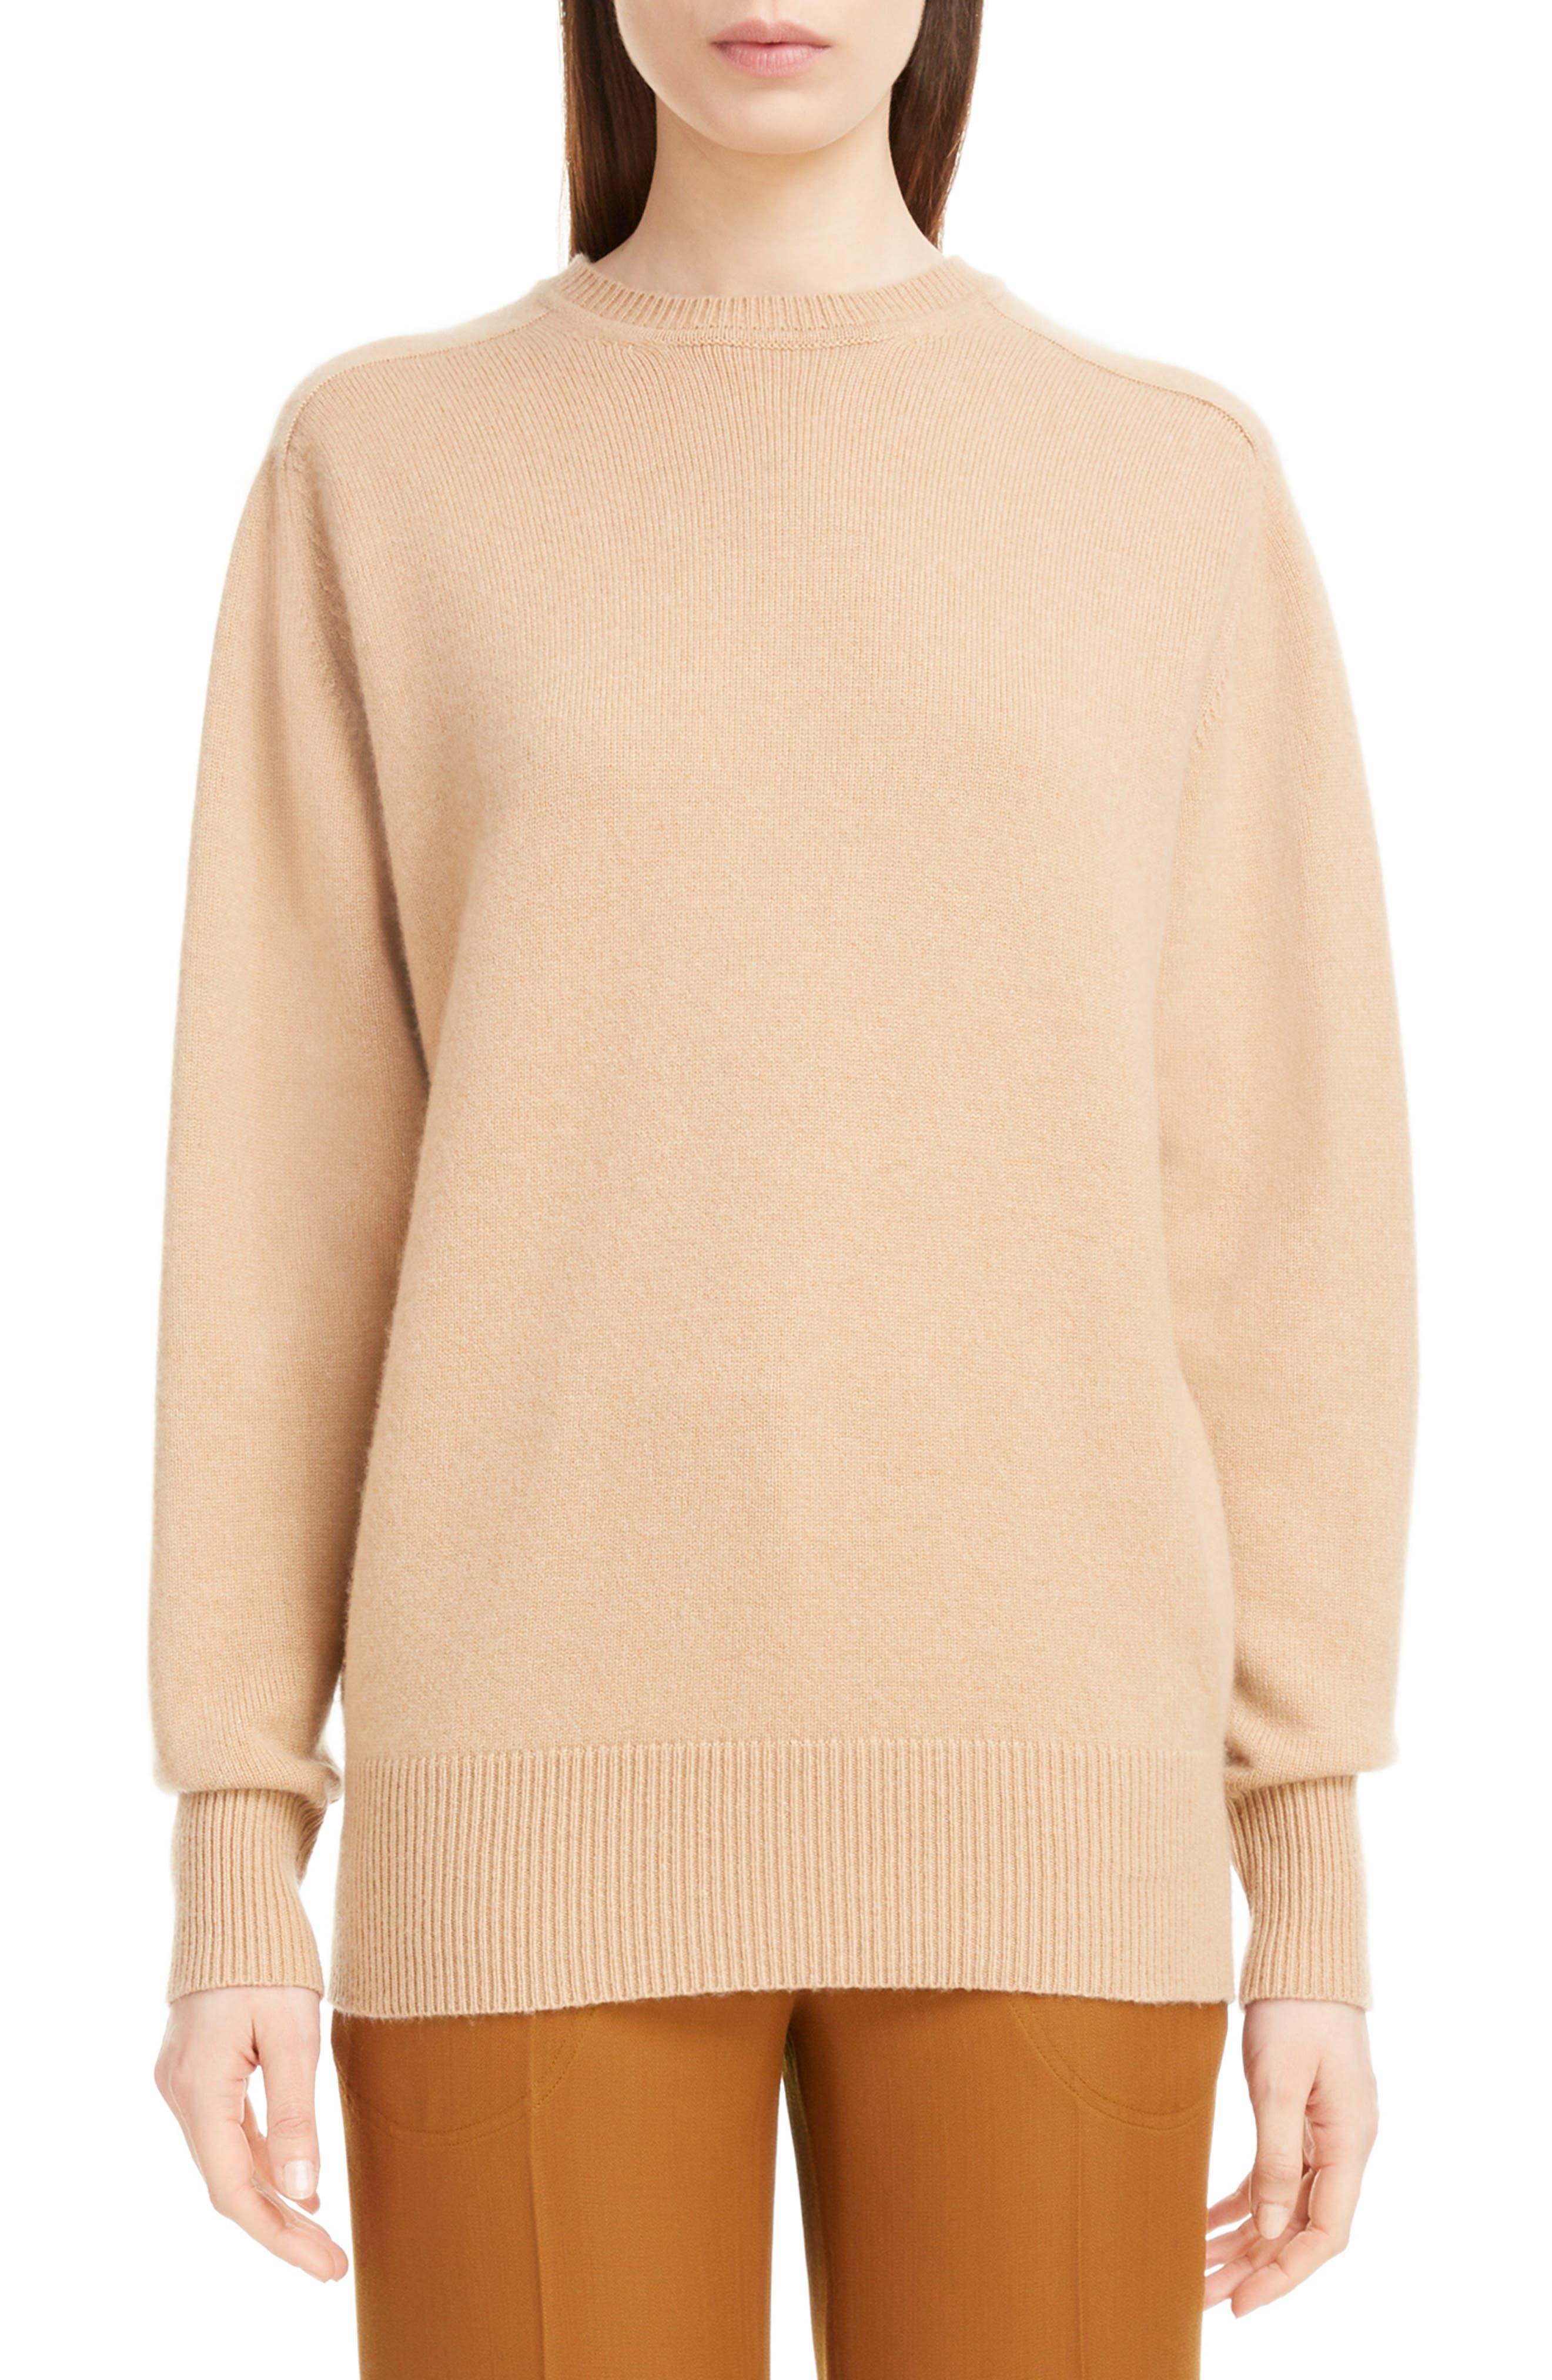 Victoria Beckham Cashmere Blend Sweater